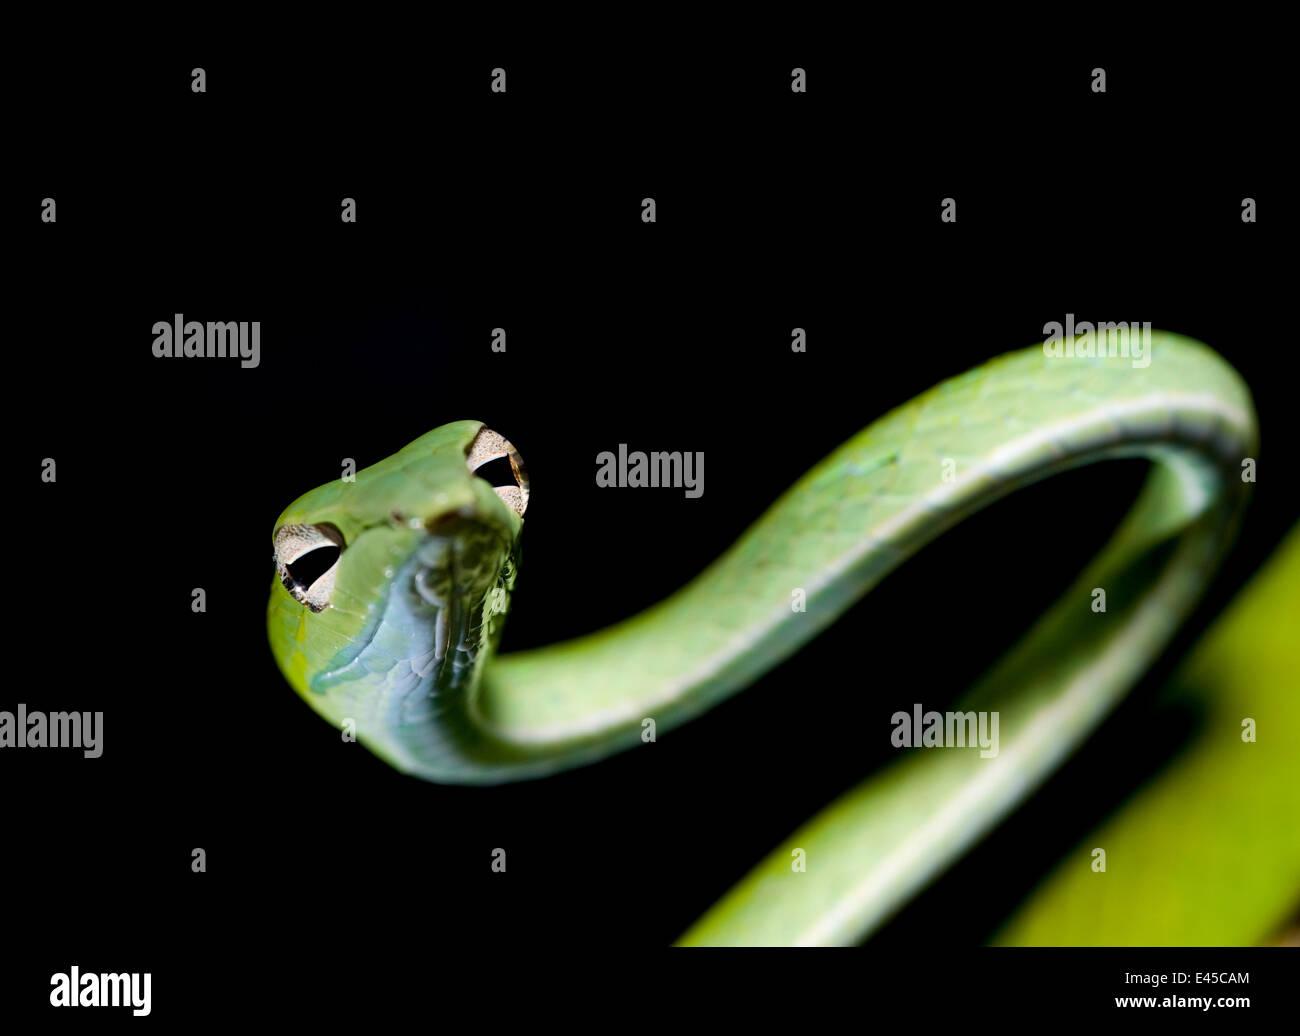 Whip oriental / vigne / long nez serpent (Ahaetulla prasina) Bako NP, Sarawak, Bornéo, Malaisie Banque D'Images